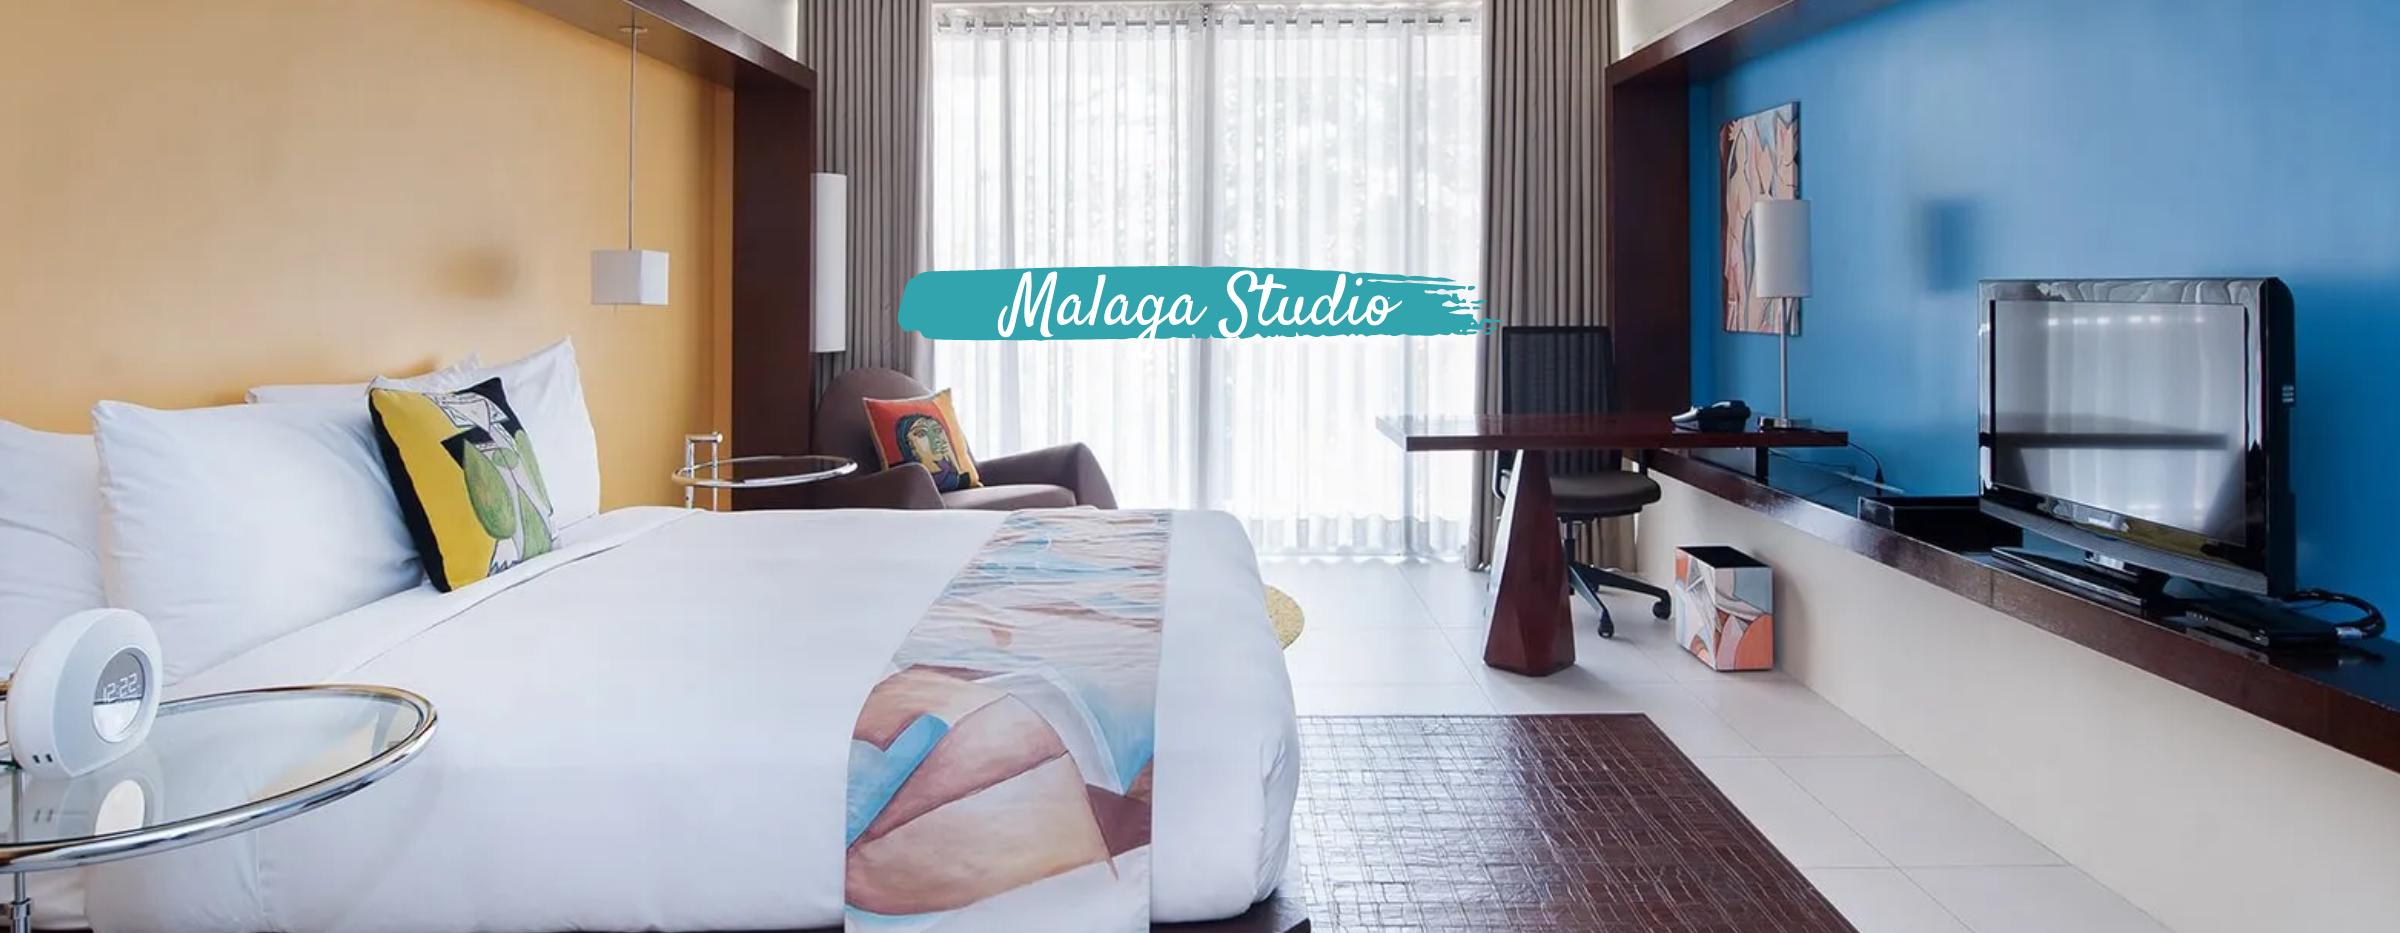 Inside the Malaga Studio at Picasso Hotel in Makati